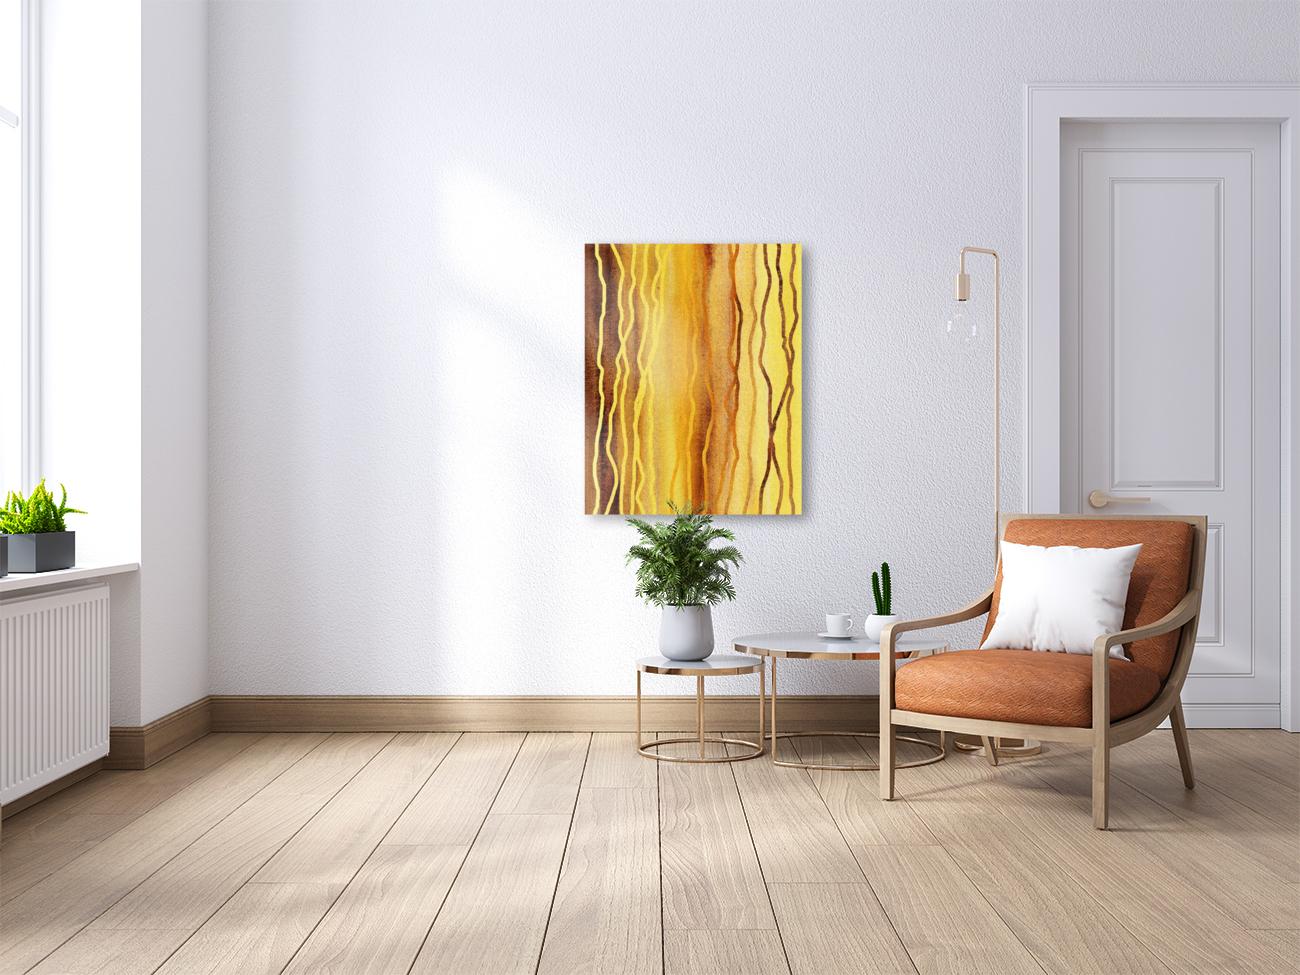 Organic Lines Beige Abstract  Art